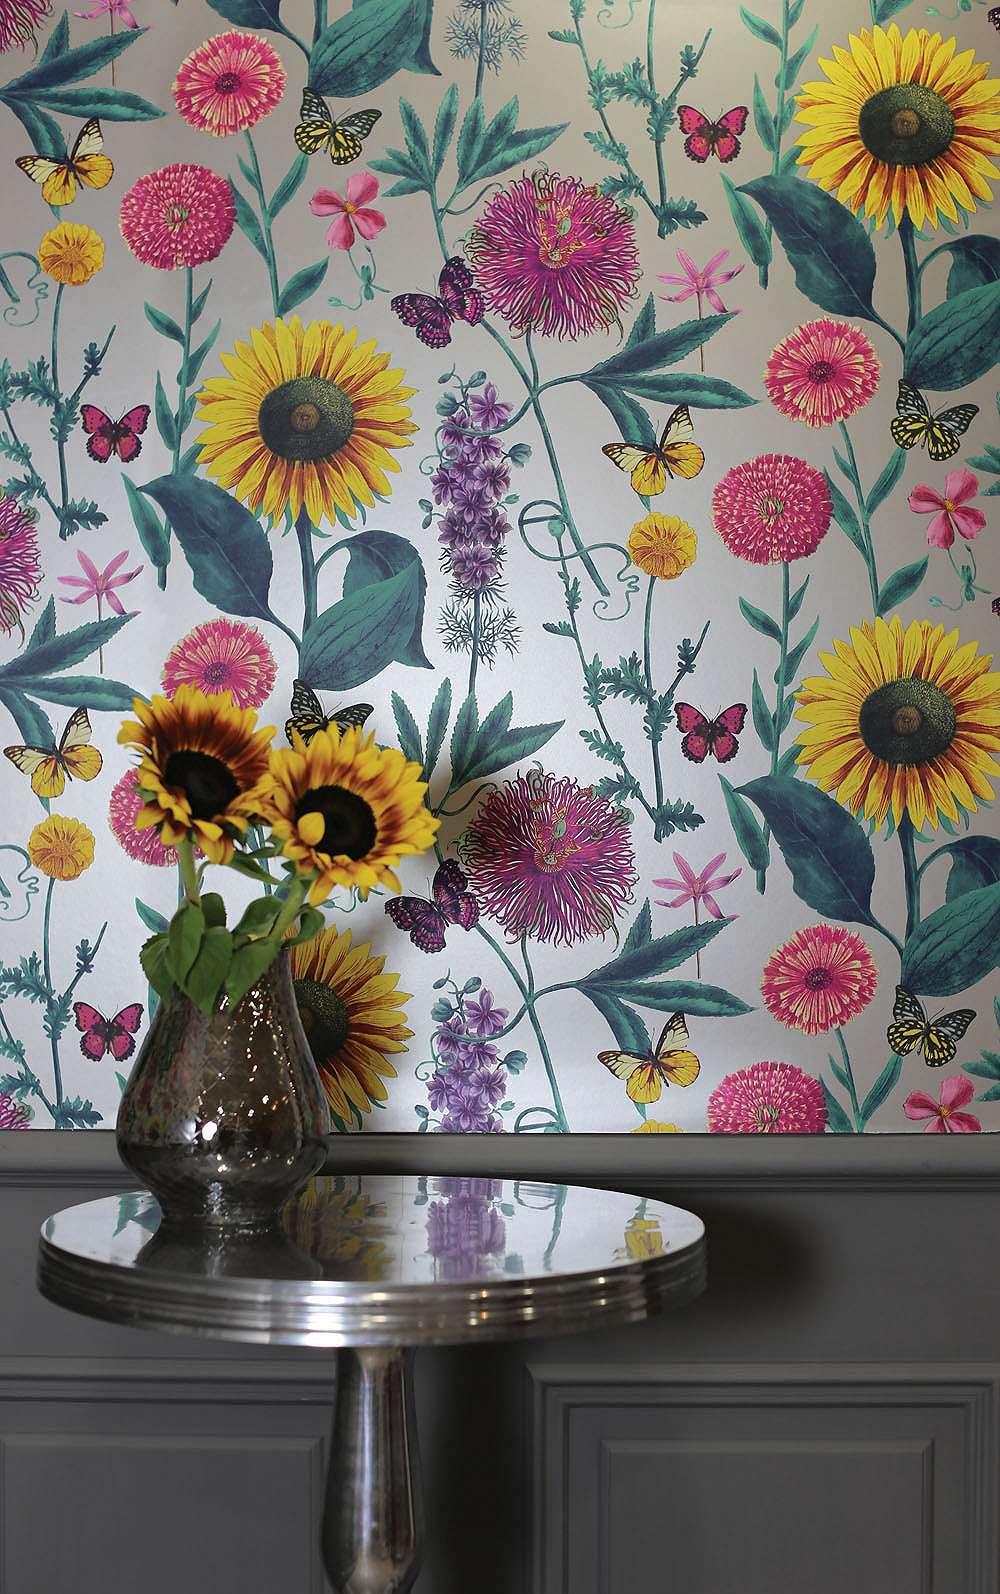 Tapéta szürke alapon vibrálú vintage virág mintákkal